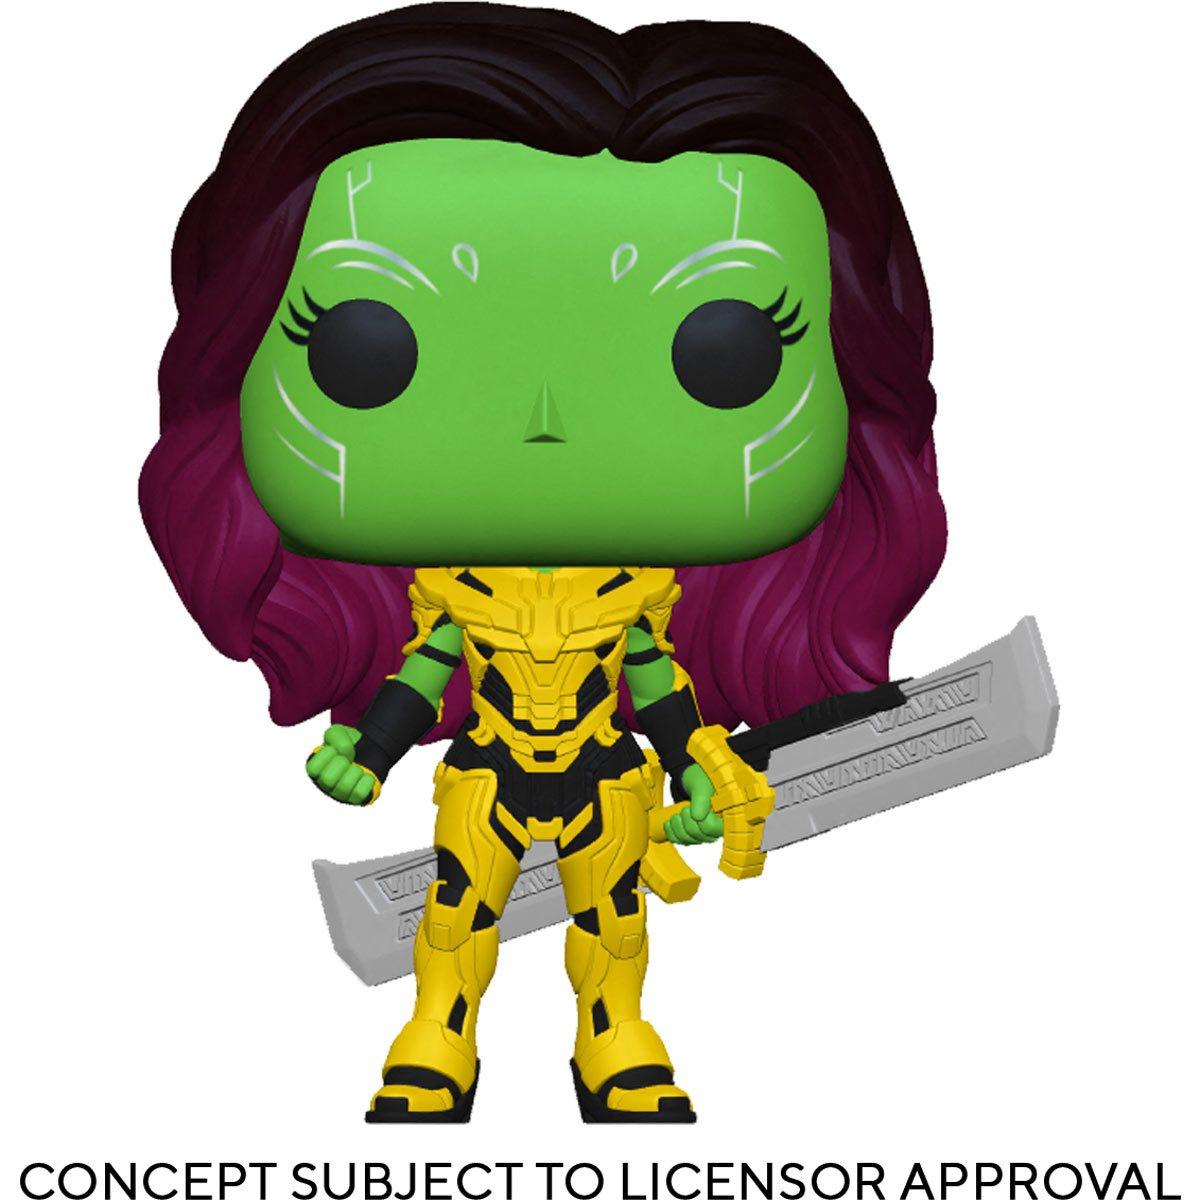 PRÉ VENDA: Funko Pop! Gamora Blade of Thanos: What If...? Marvel - Funko